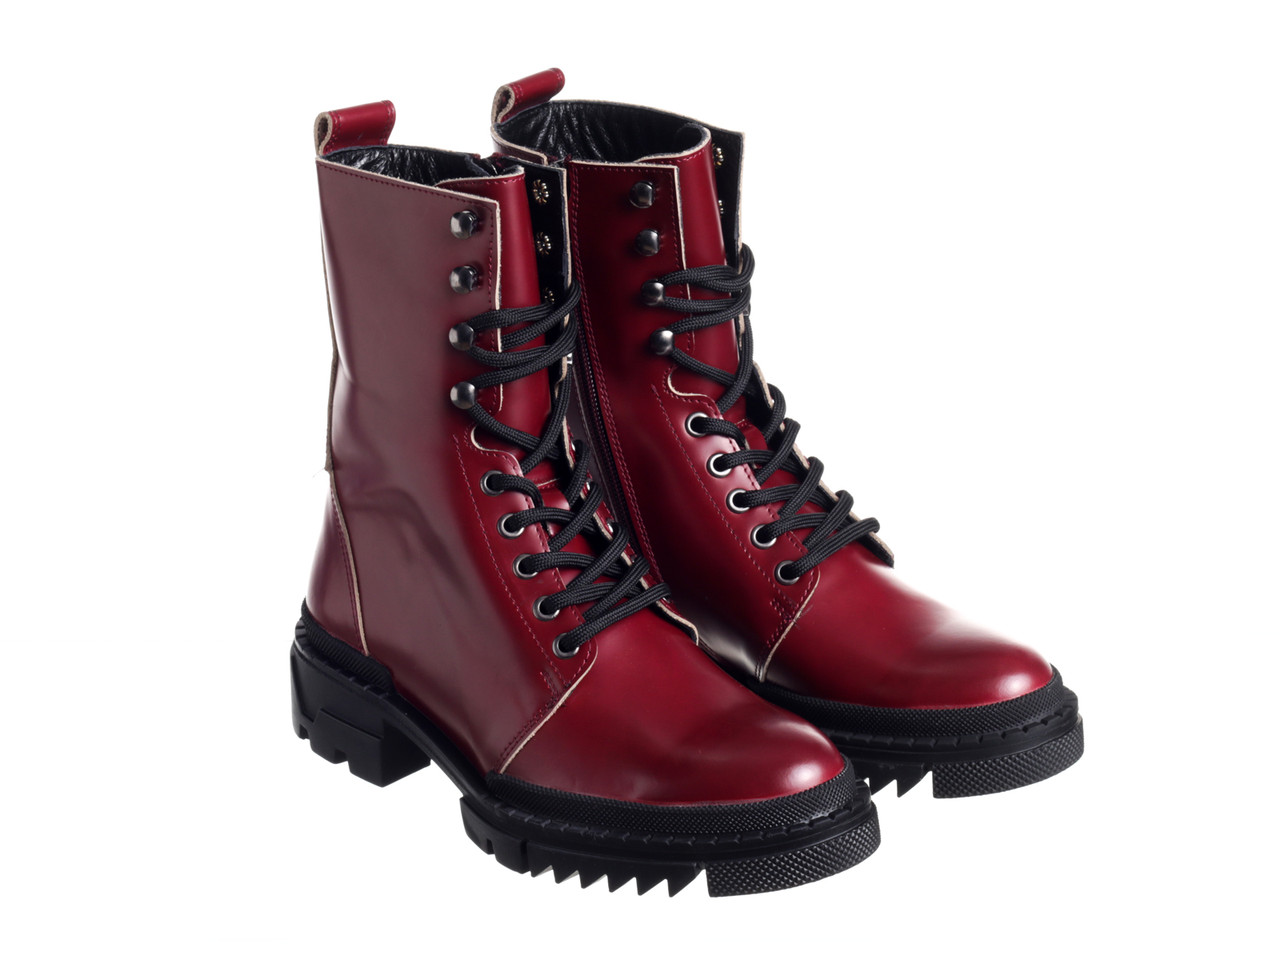 Ботинки Etor 6760-7449-2-201 бордо